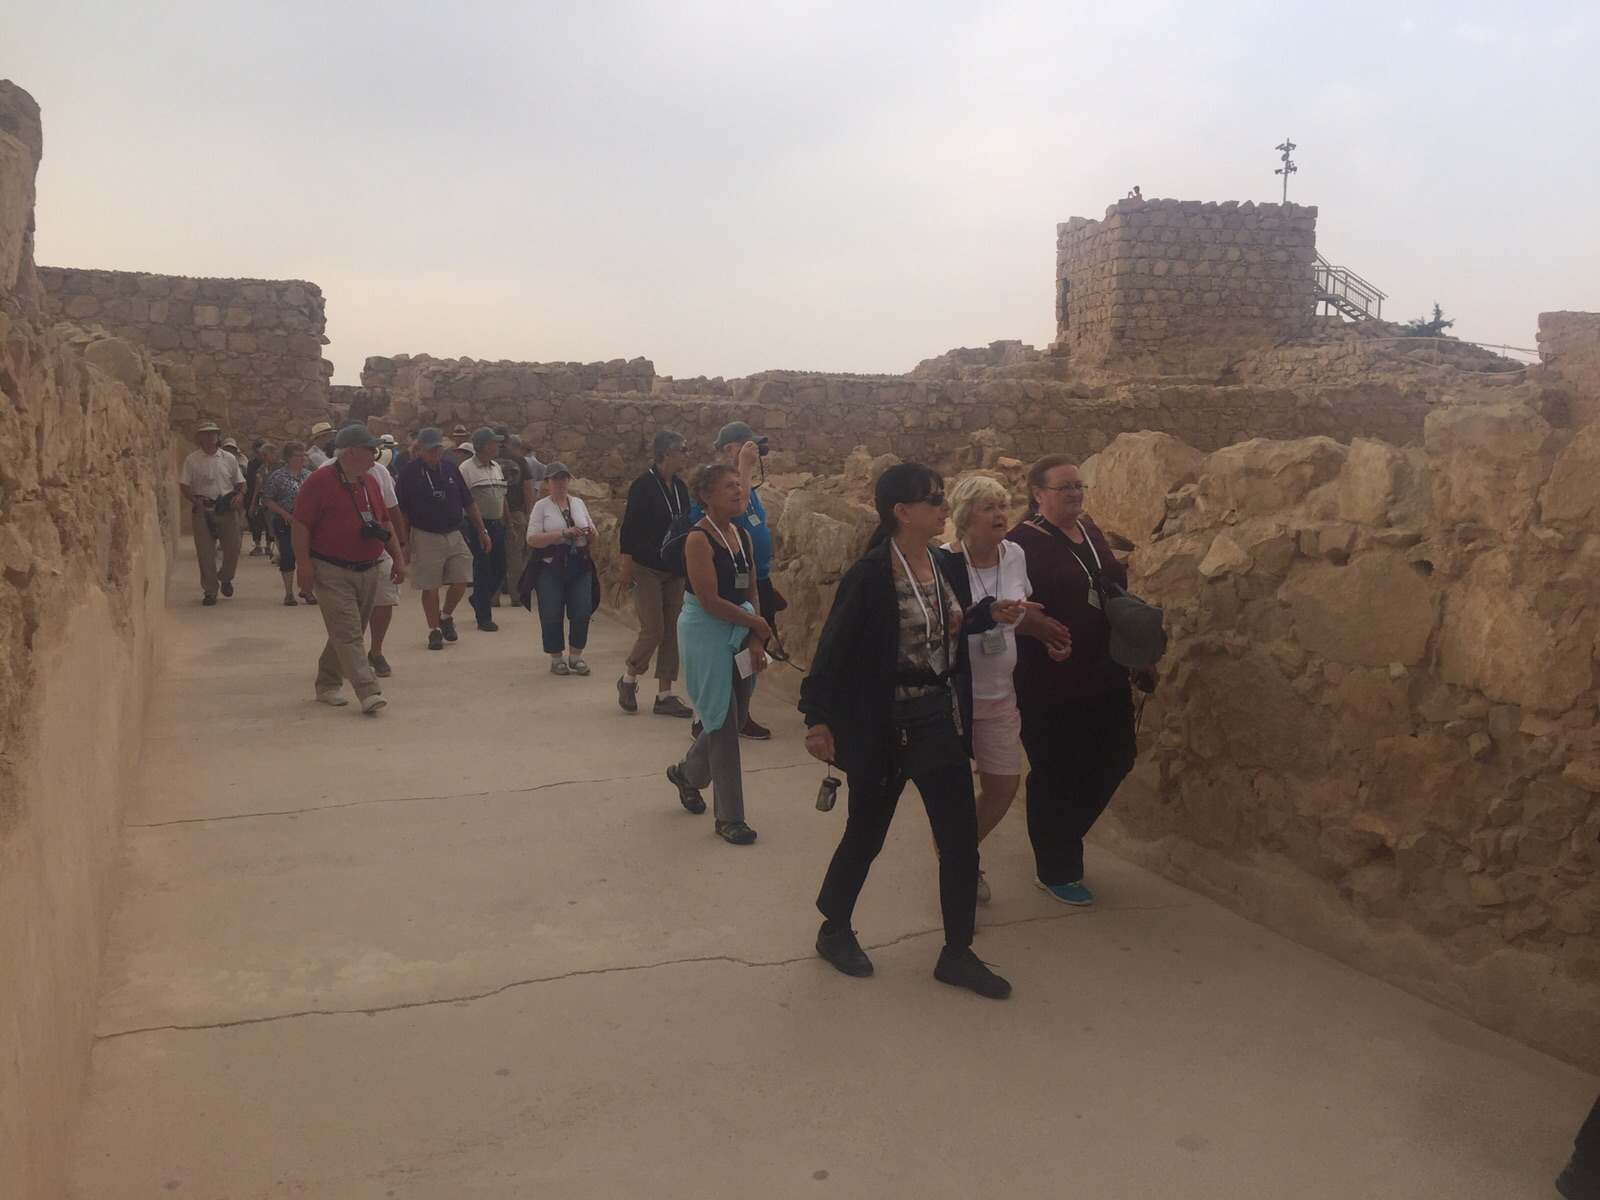 HL15 Thompson group exploring Masada on 10-20.jpeg